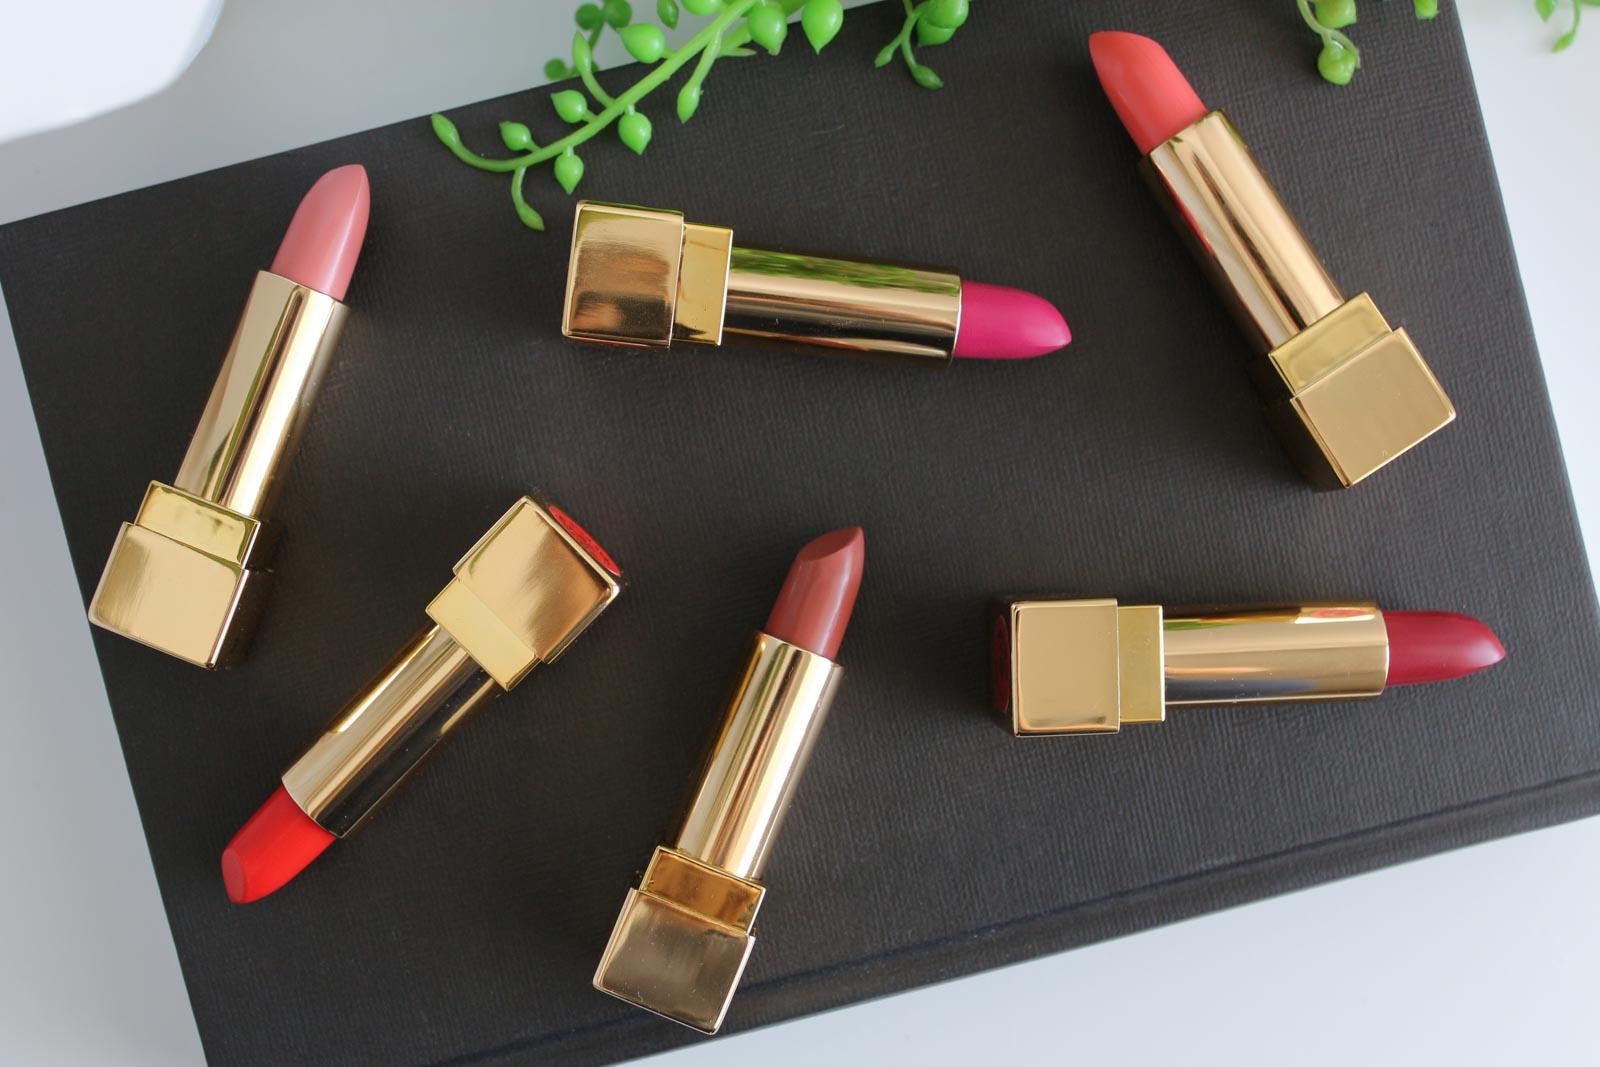 Tanya Burr Cosmetics Lipsticks With Swatches | Cate Renée